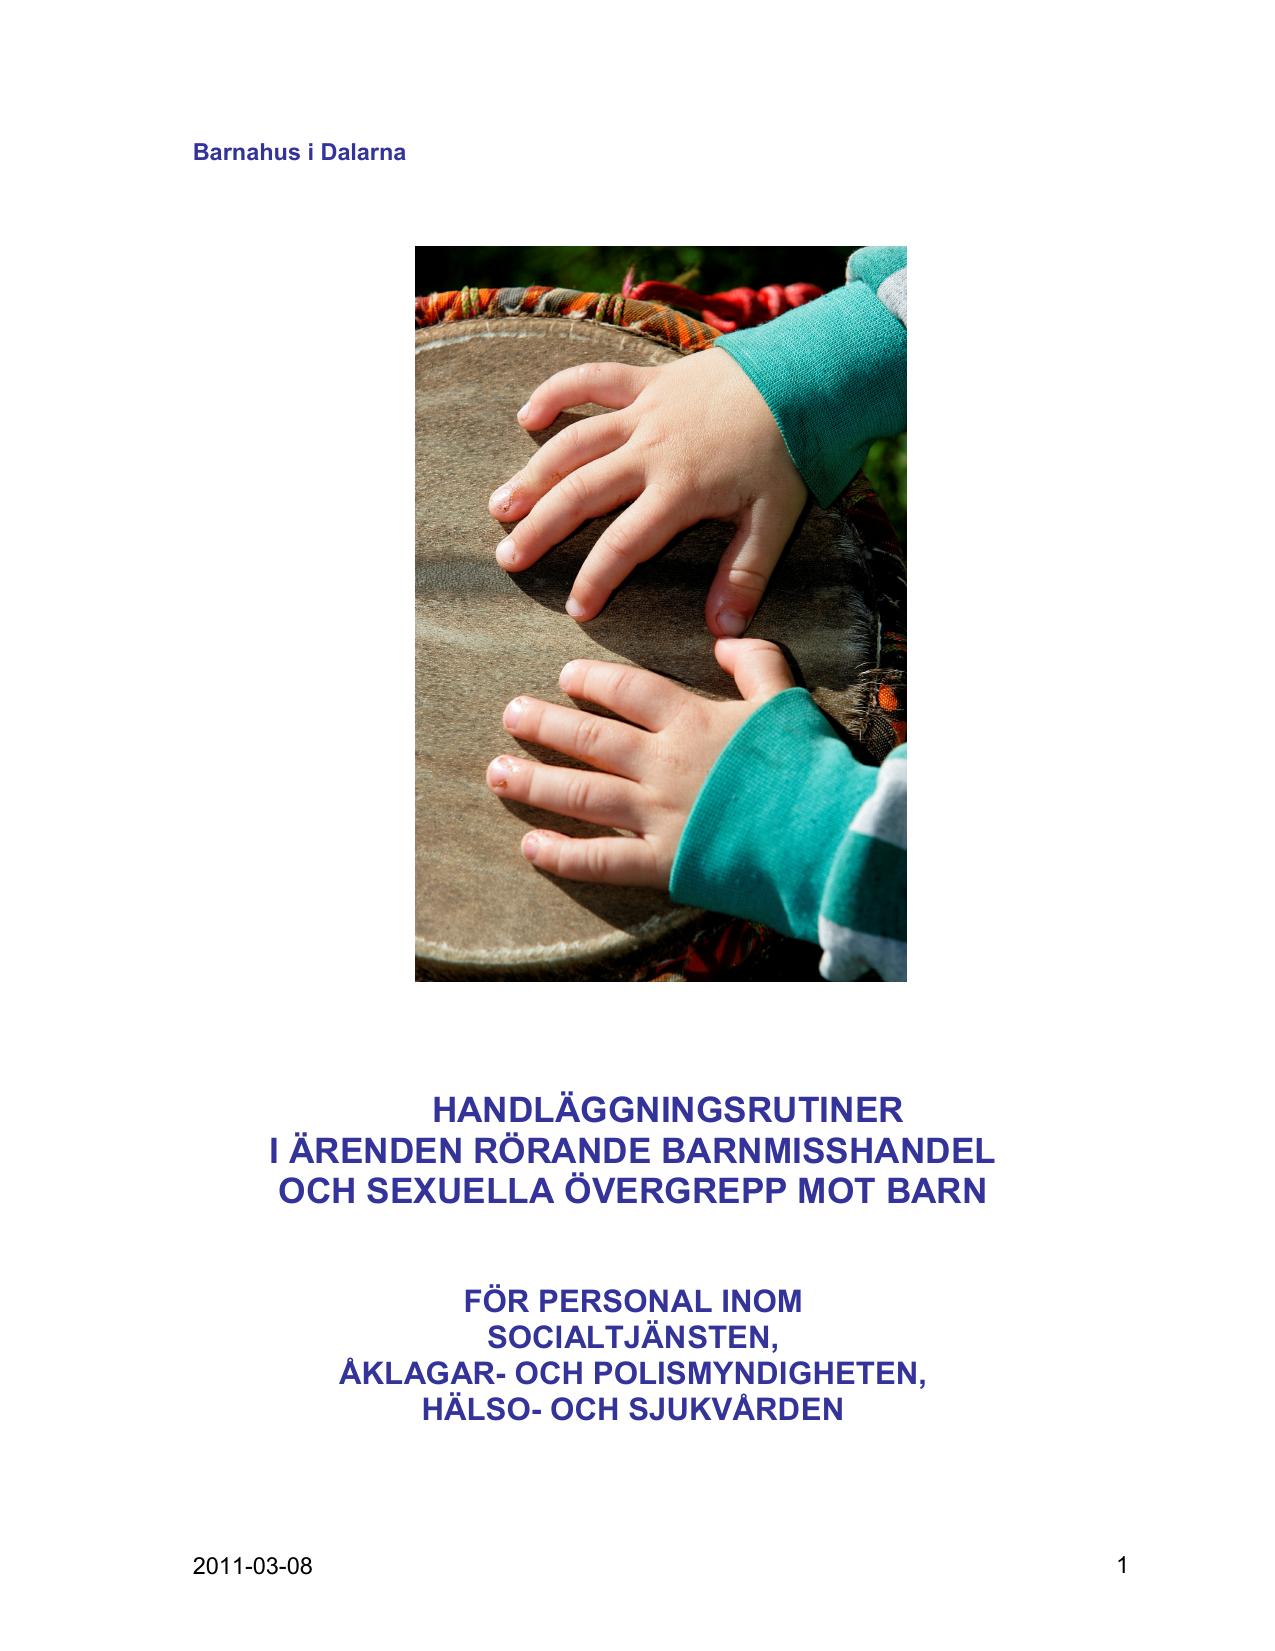 Varden anmaler inte barnmisshandel och overgrepp